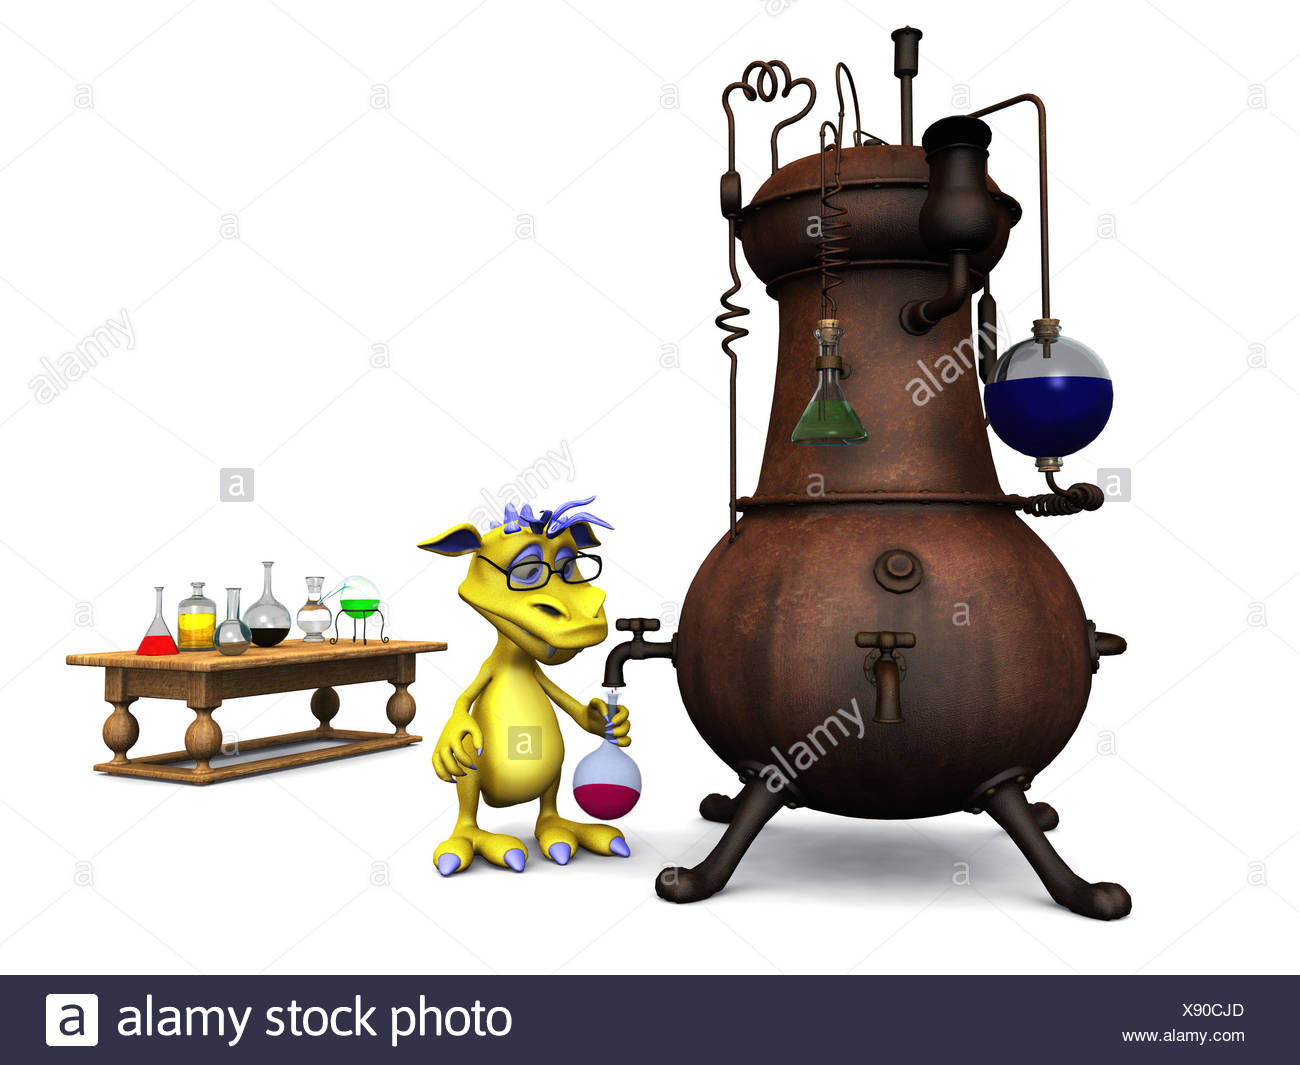 Cartoon Science Beaker Stock Photos & Cartoon Science Beaker Stock